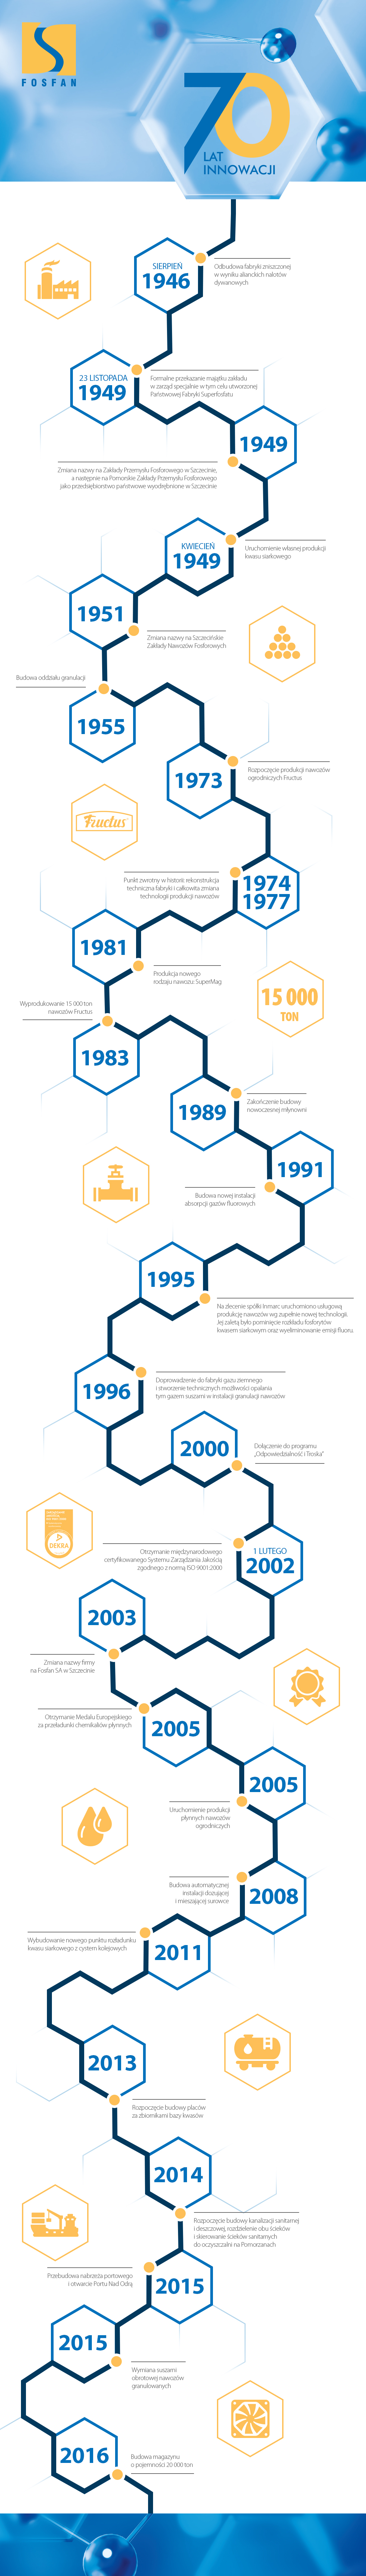 infografika - 70 lat innowacji fosfan